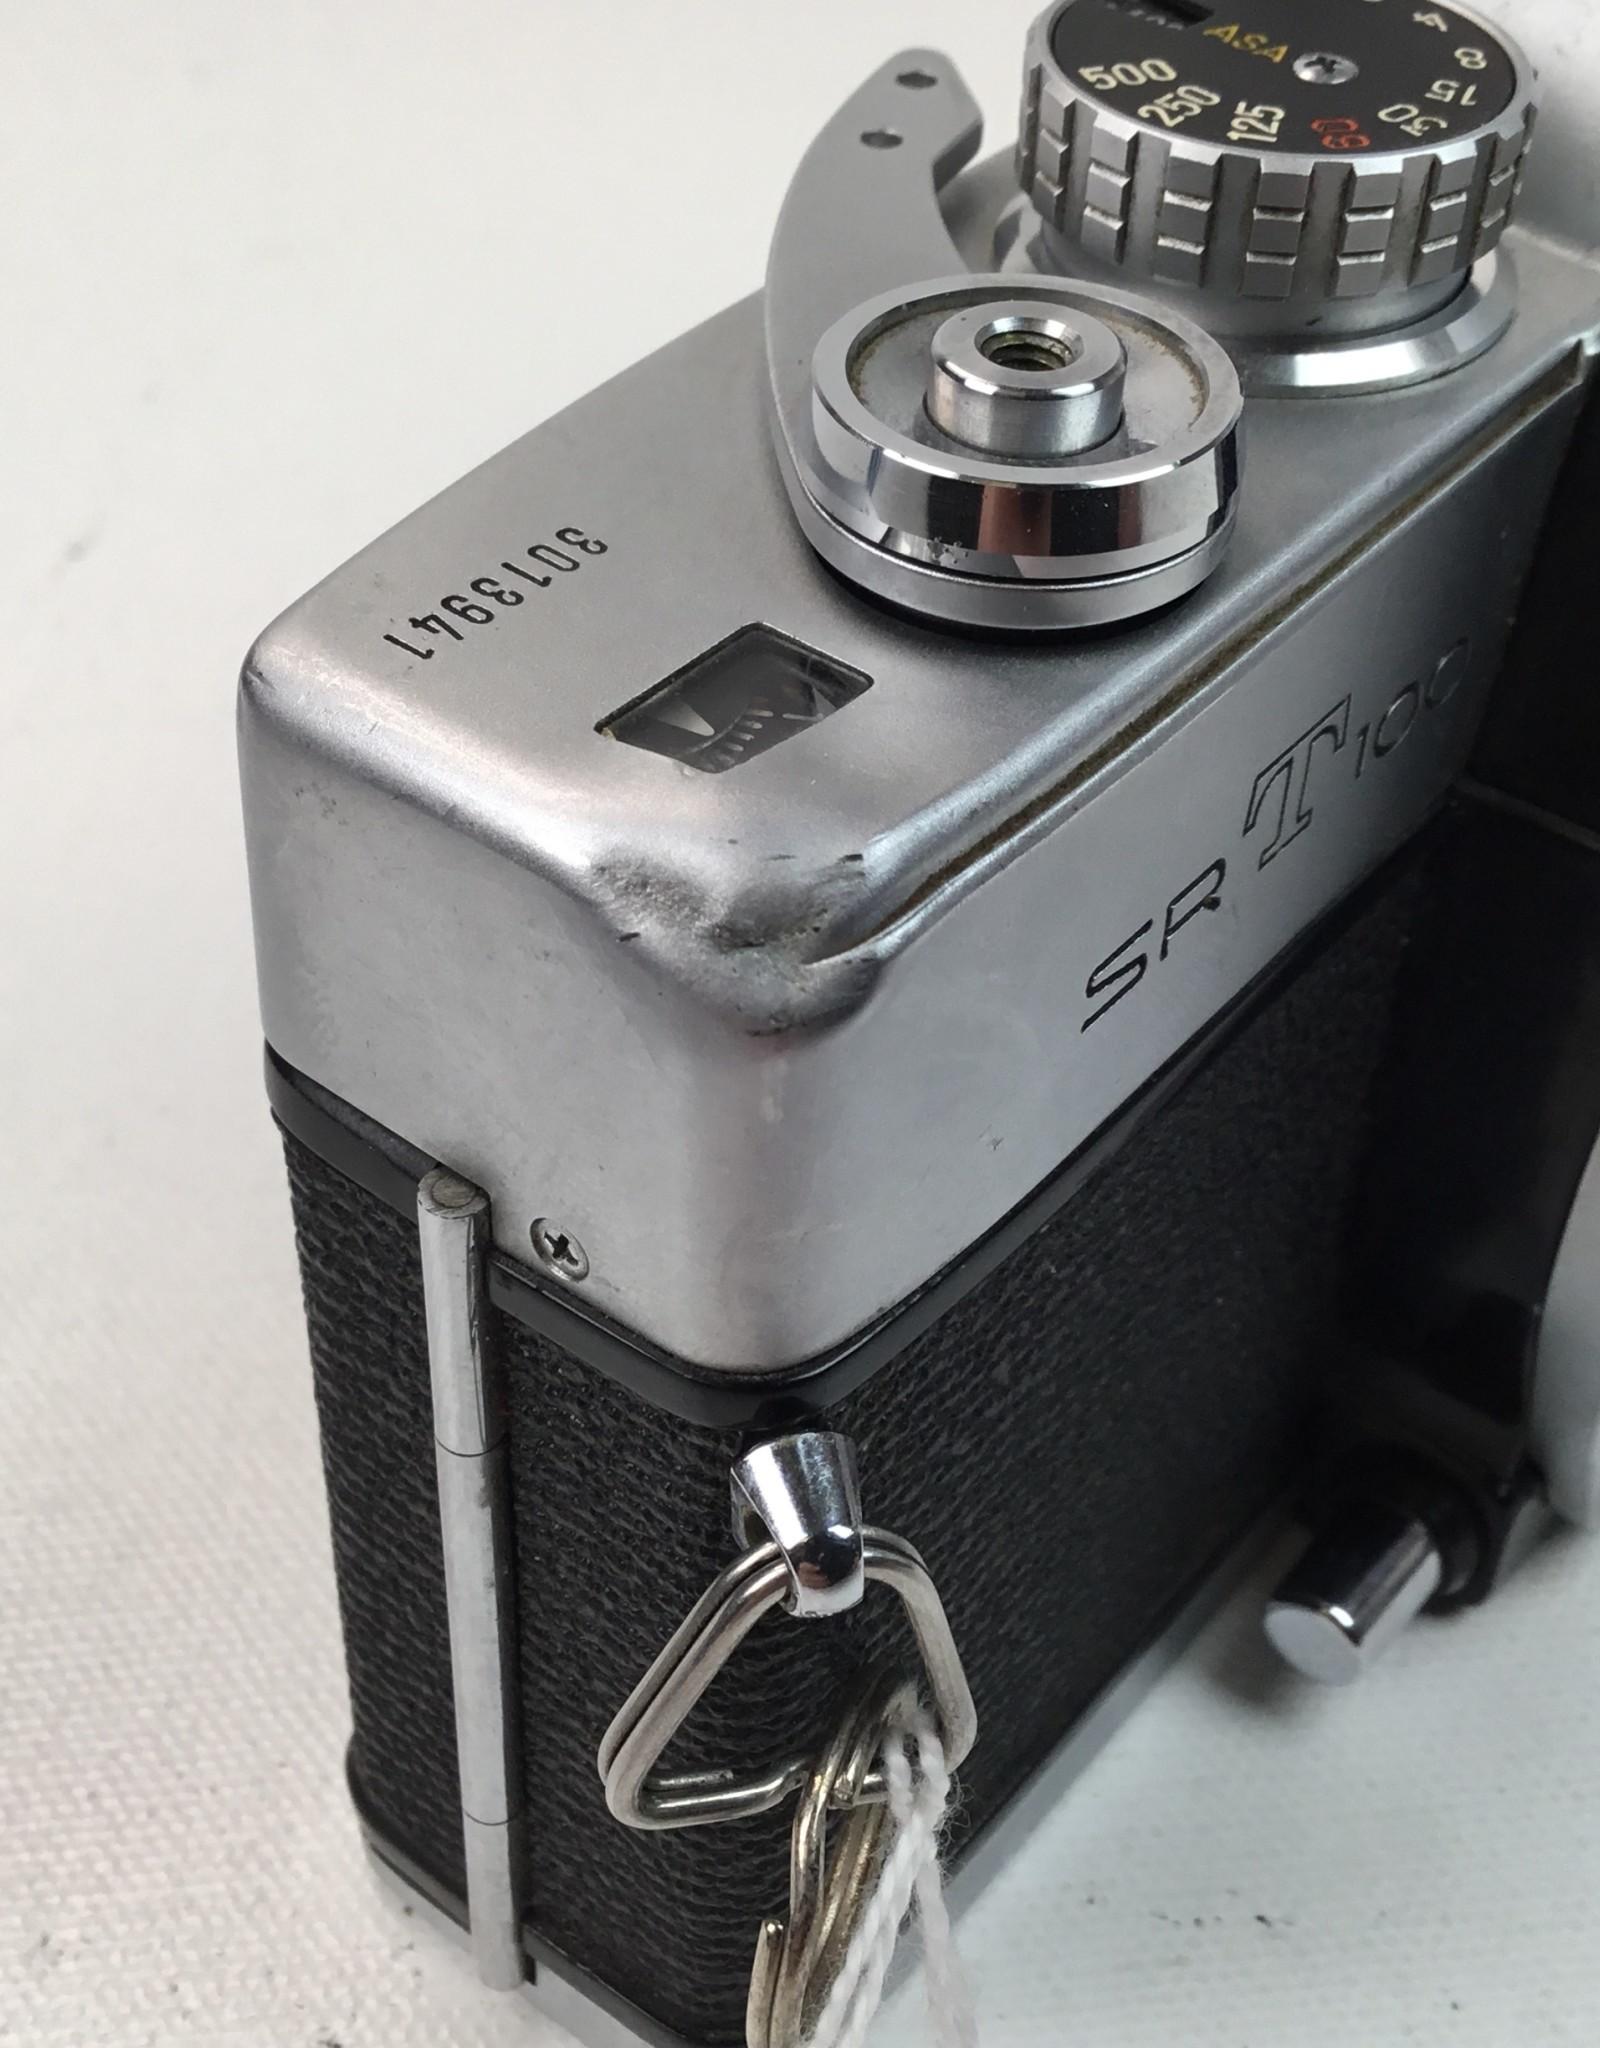 Minolta Minolta SRT 100 Film Camera Used BGN